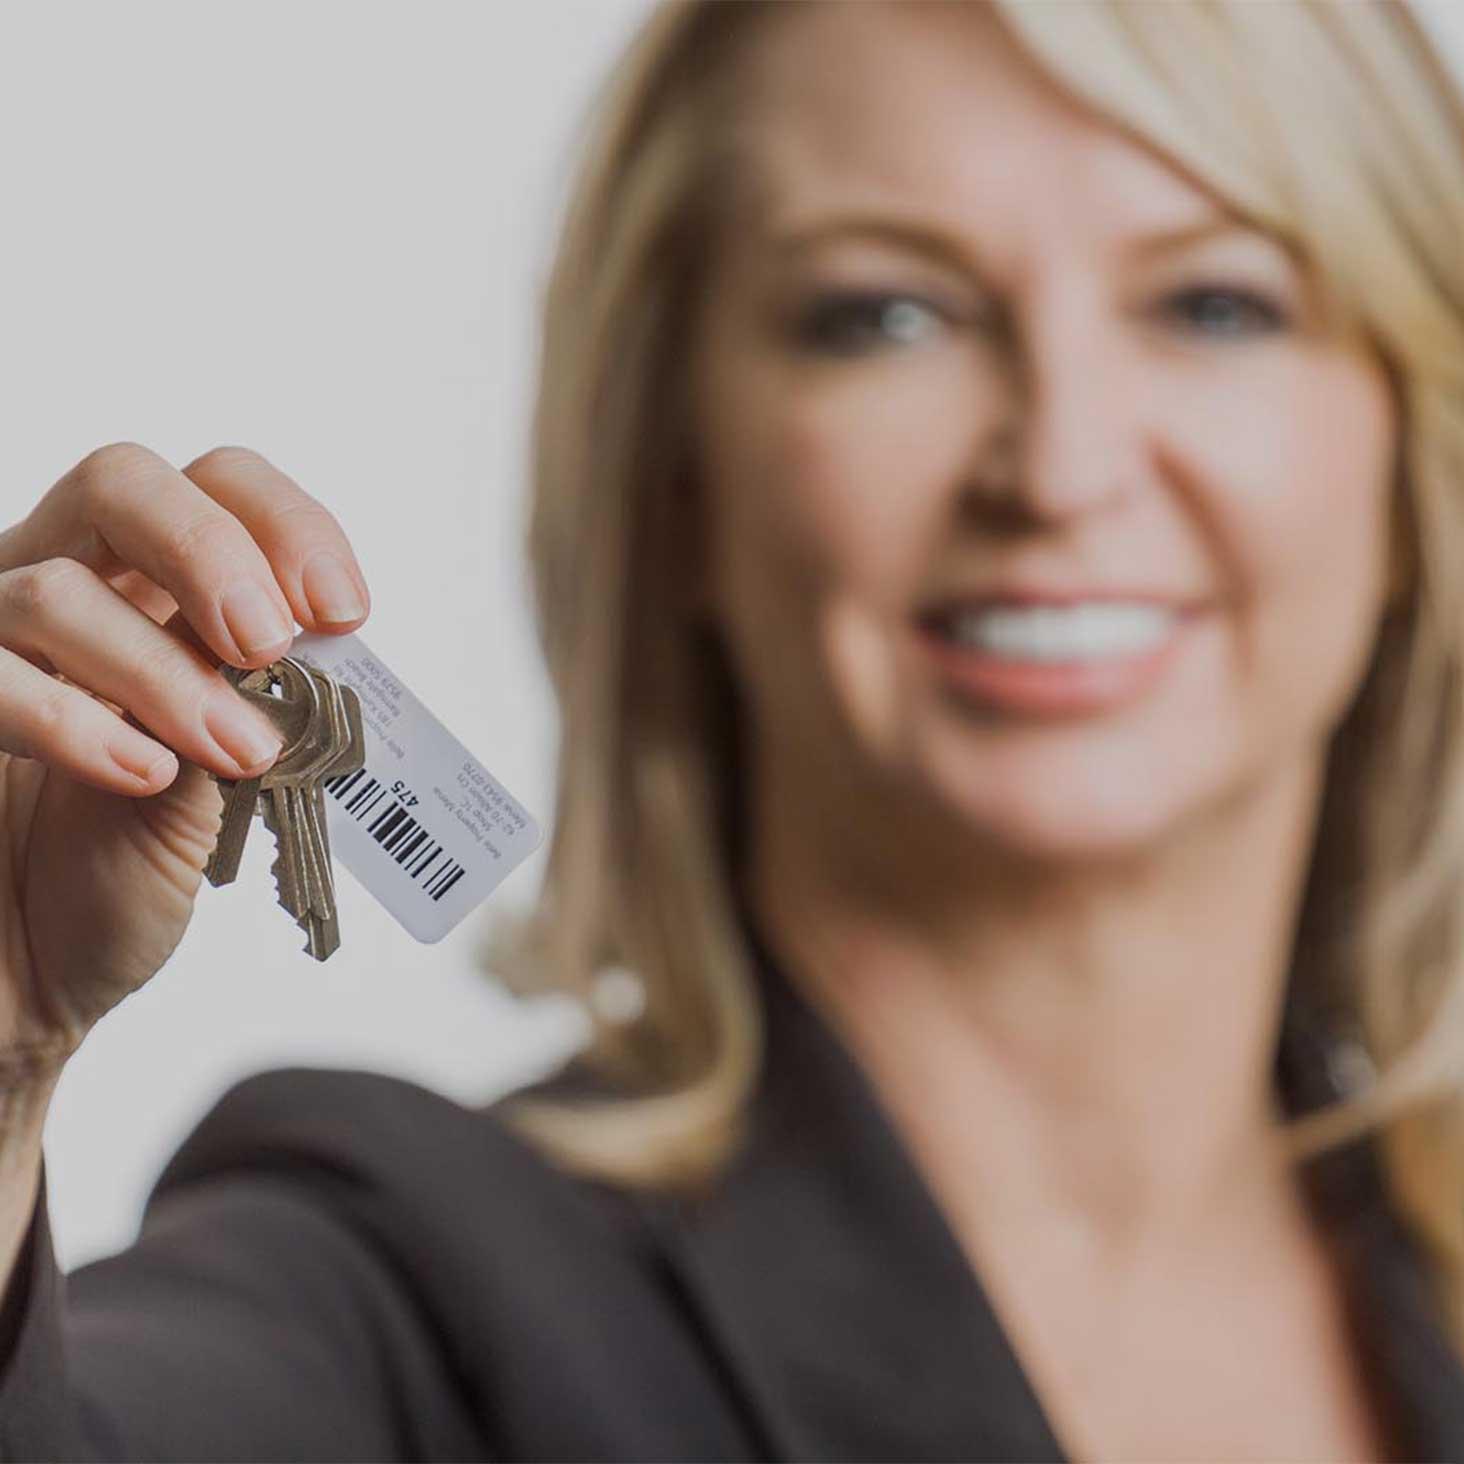 woman holding keys with logitout keytags